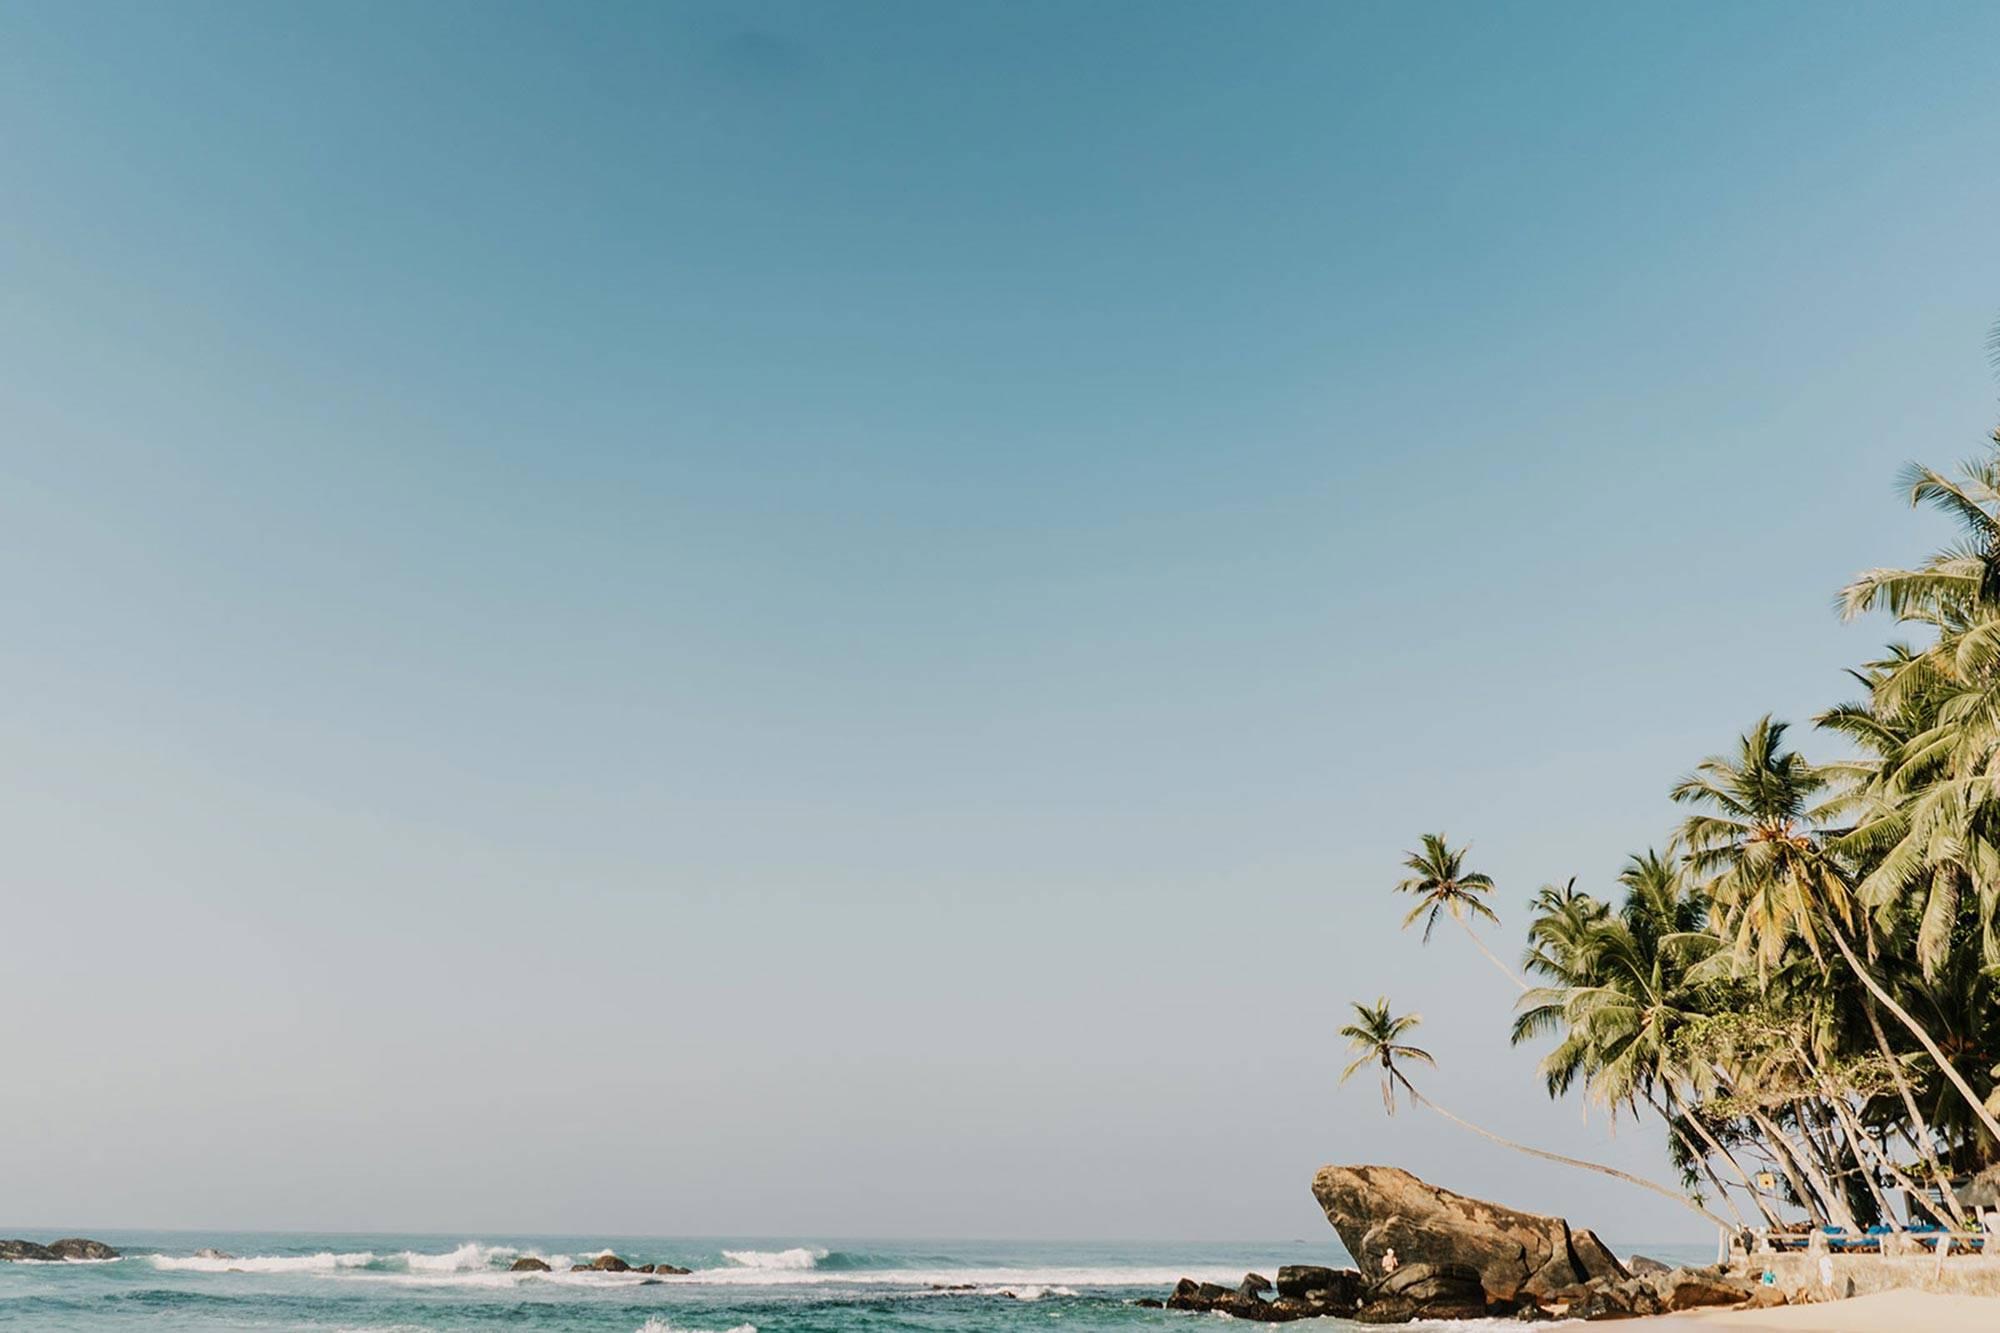 https://www.soulandsurf.com/wp-content/uploads/2021/09/RetreatsLanka-images-Sri-Lanka-2019-1.jpg